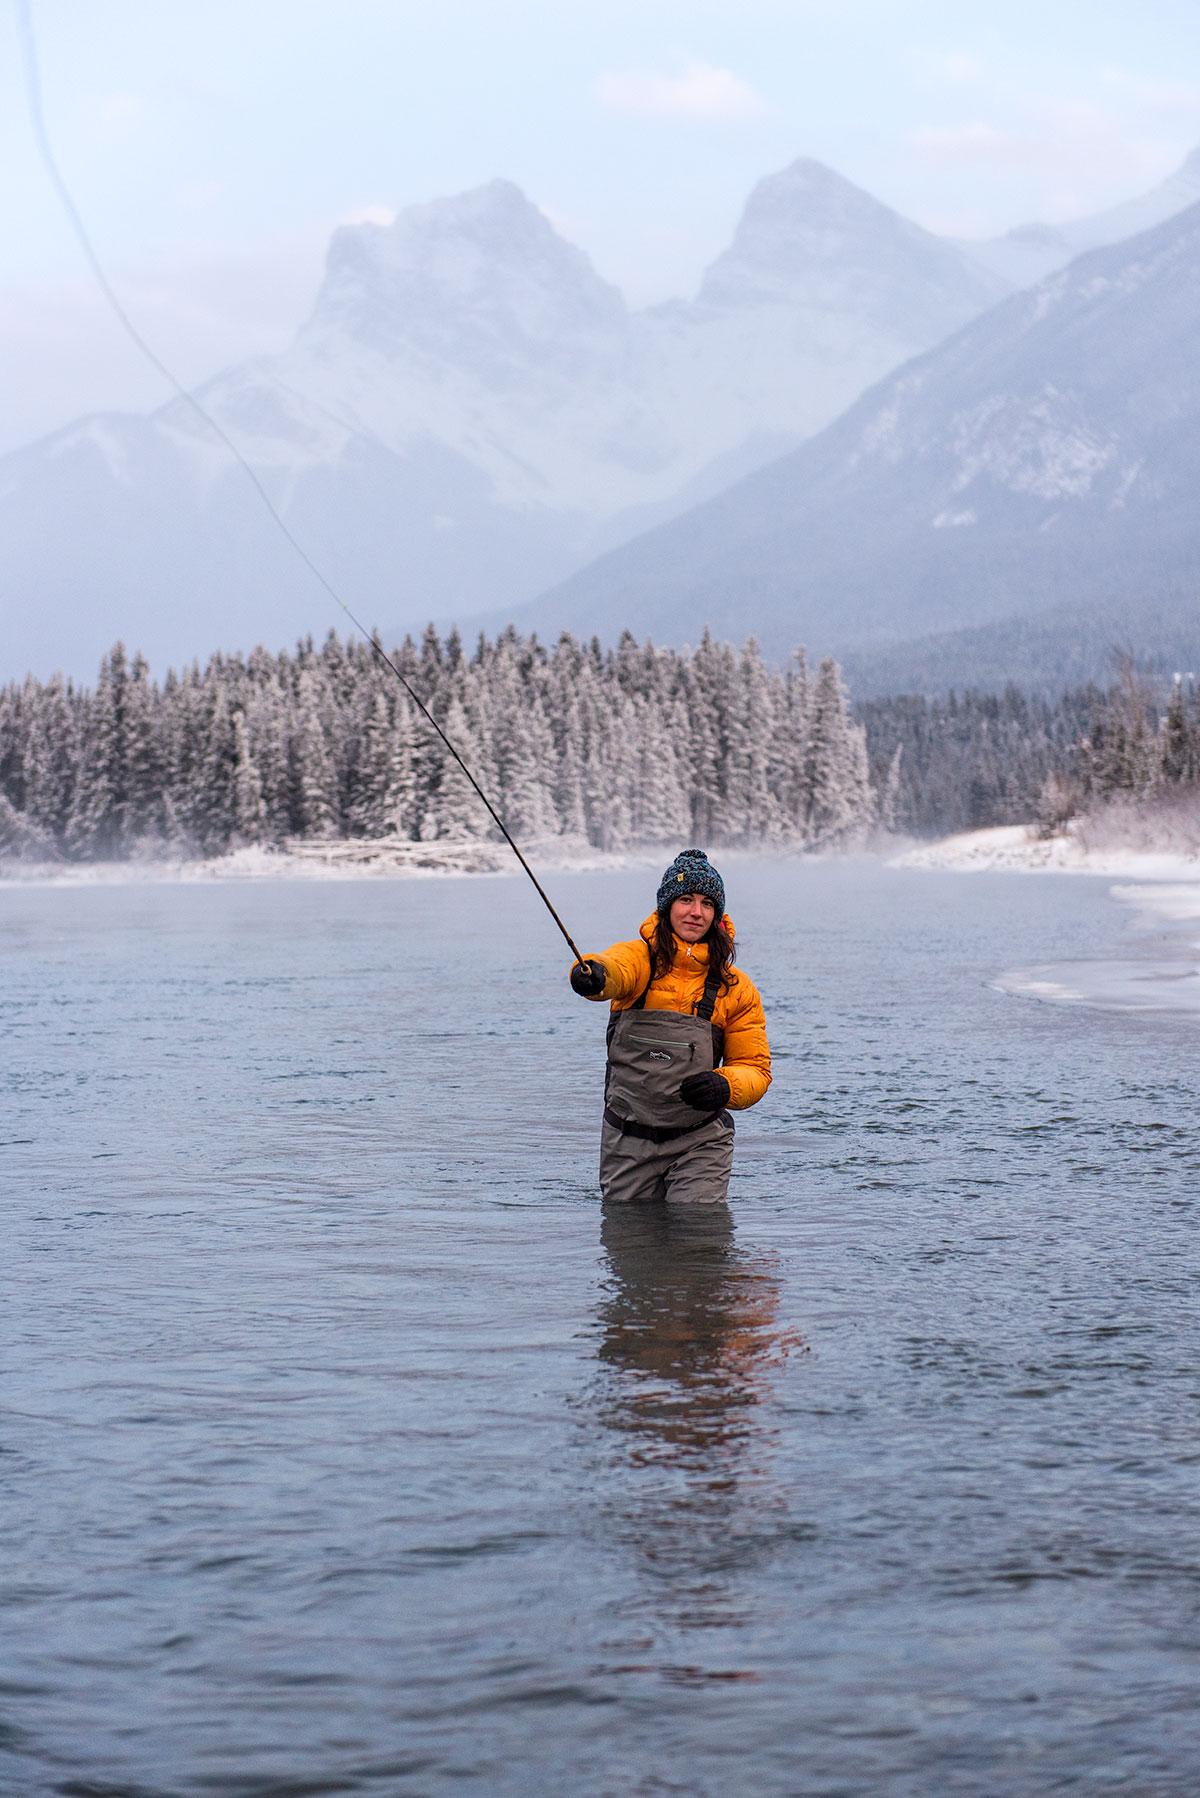 austin-trigg-patagonia-banff-alberta-winter-canada-lifestyle-adventure-mountains-bow-river-fly-fishing.jpg